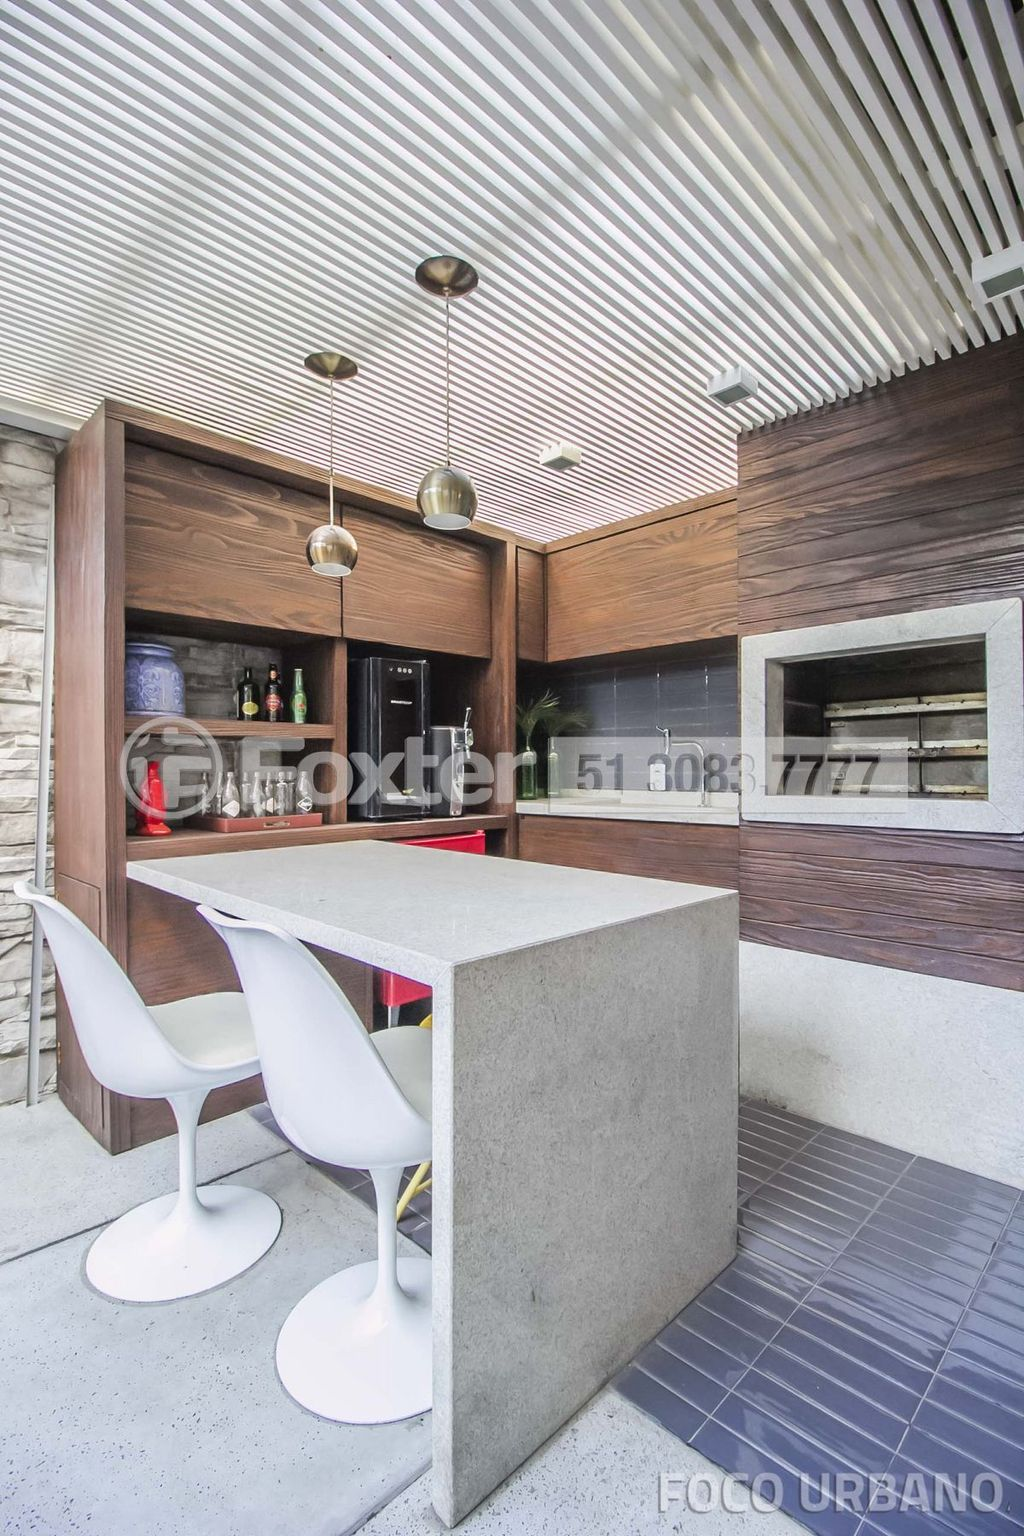 Terra Mater - Casa 3 Dorm, Jardim Carvalho, Porto Alegre (2665) - Foto 20